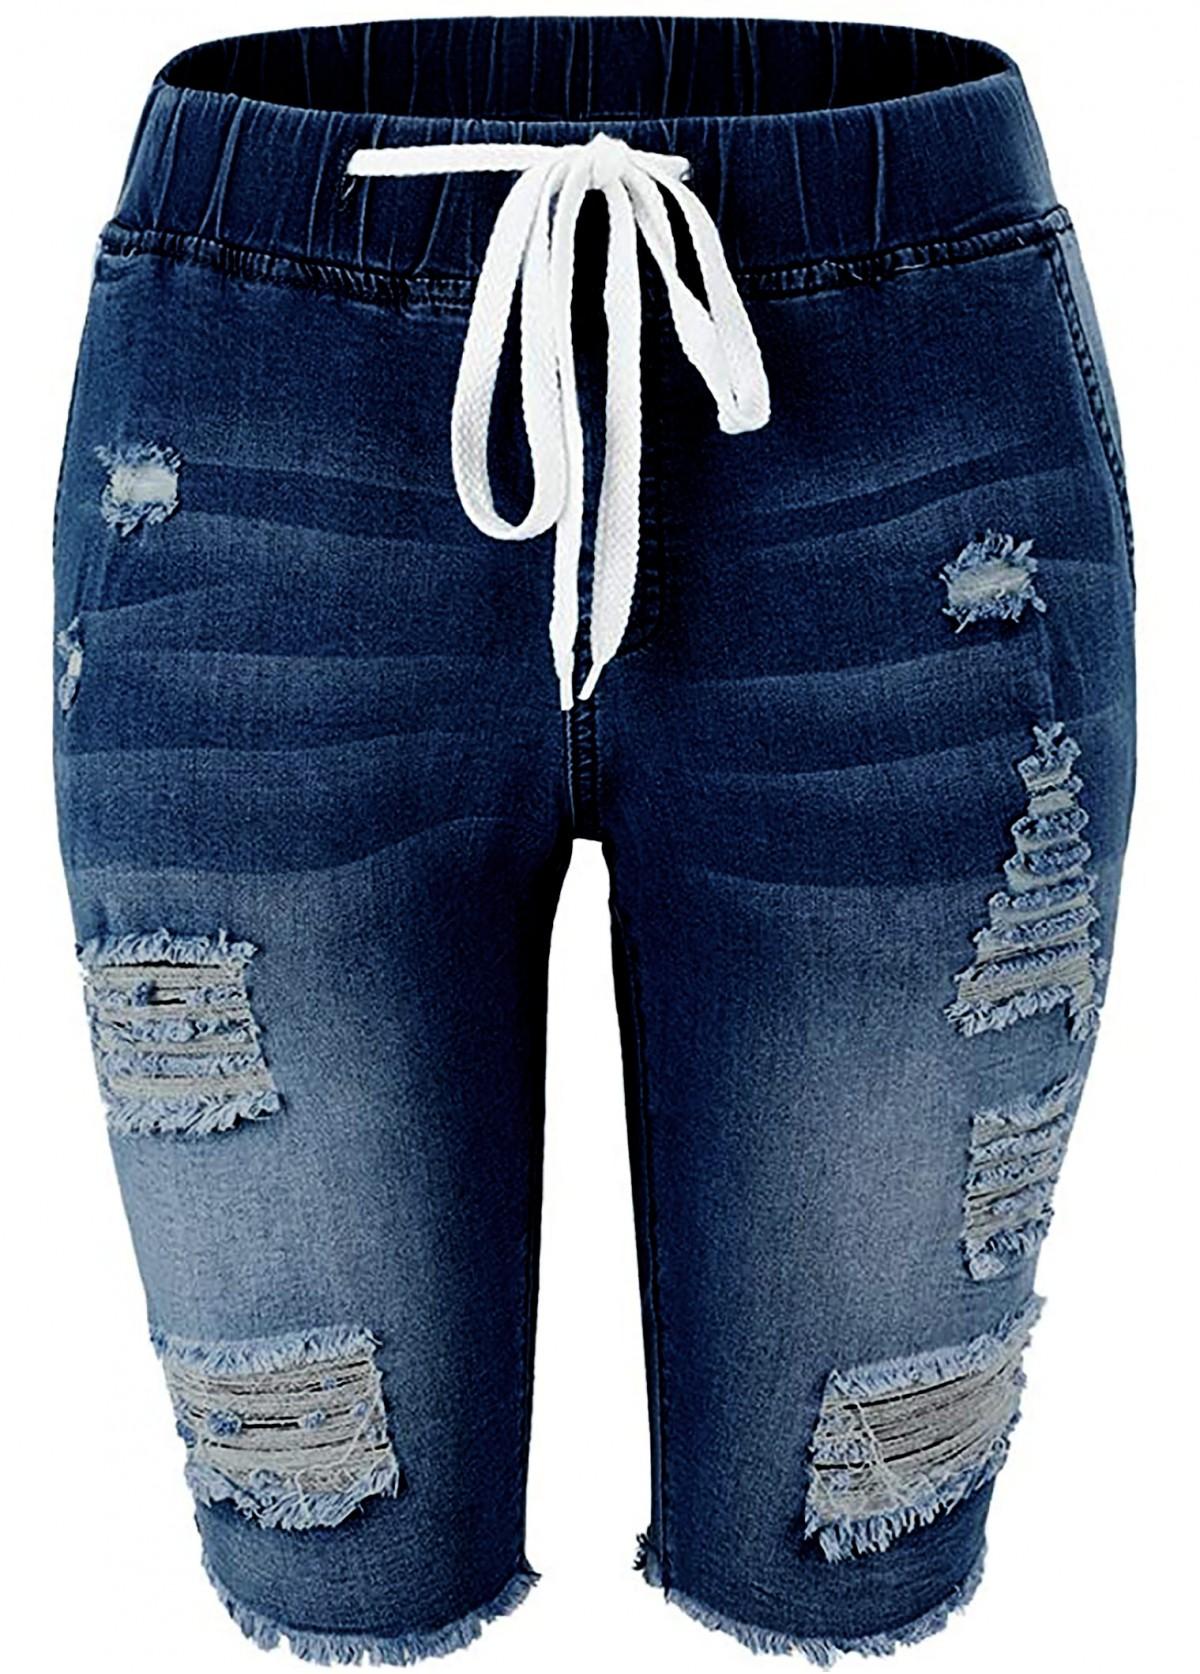 Shredded Drawstring Waist Denim Blue Shorts